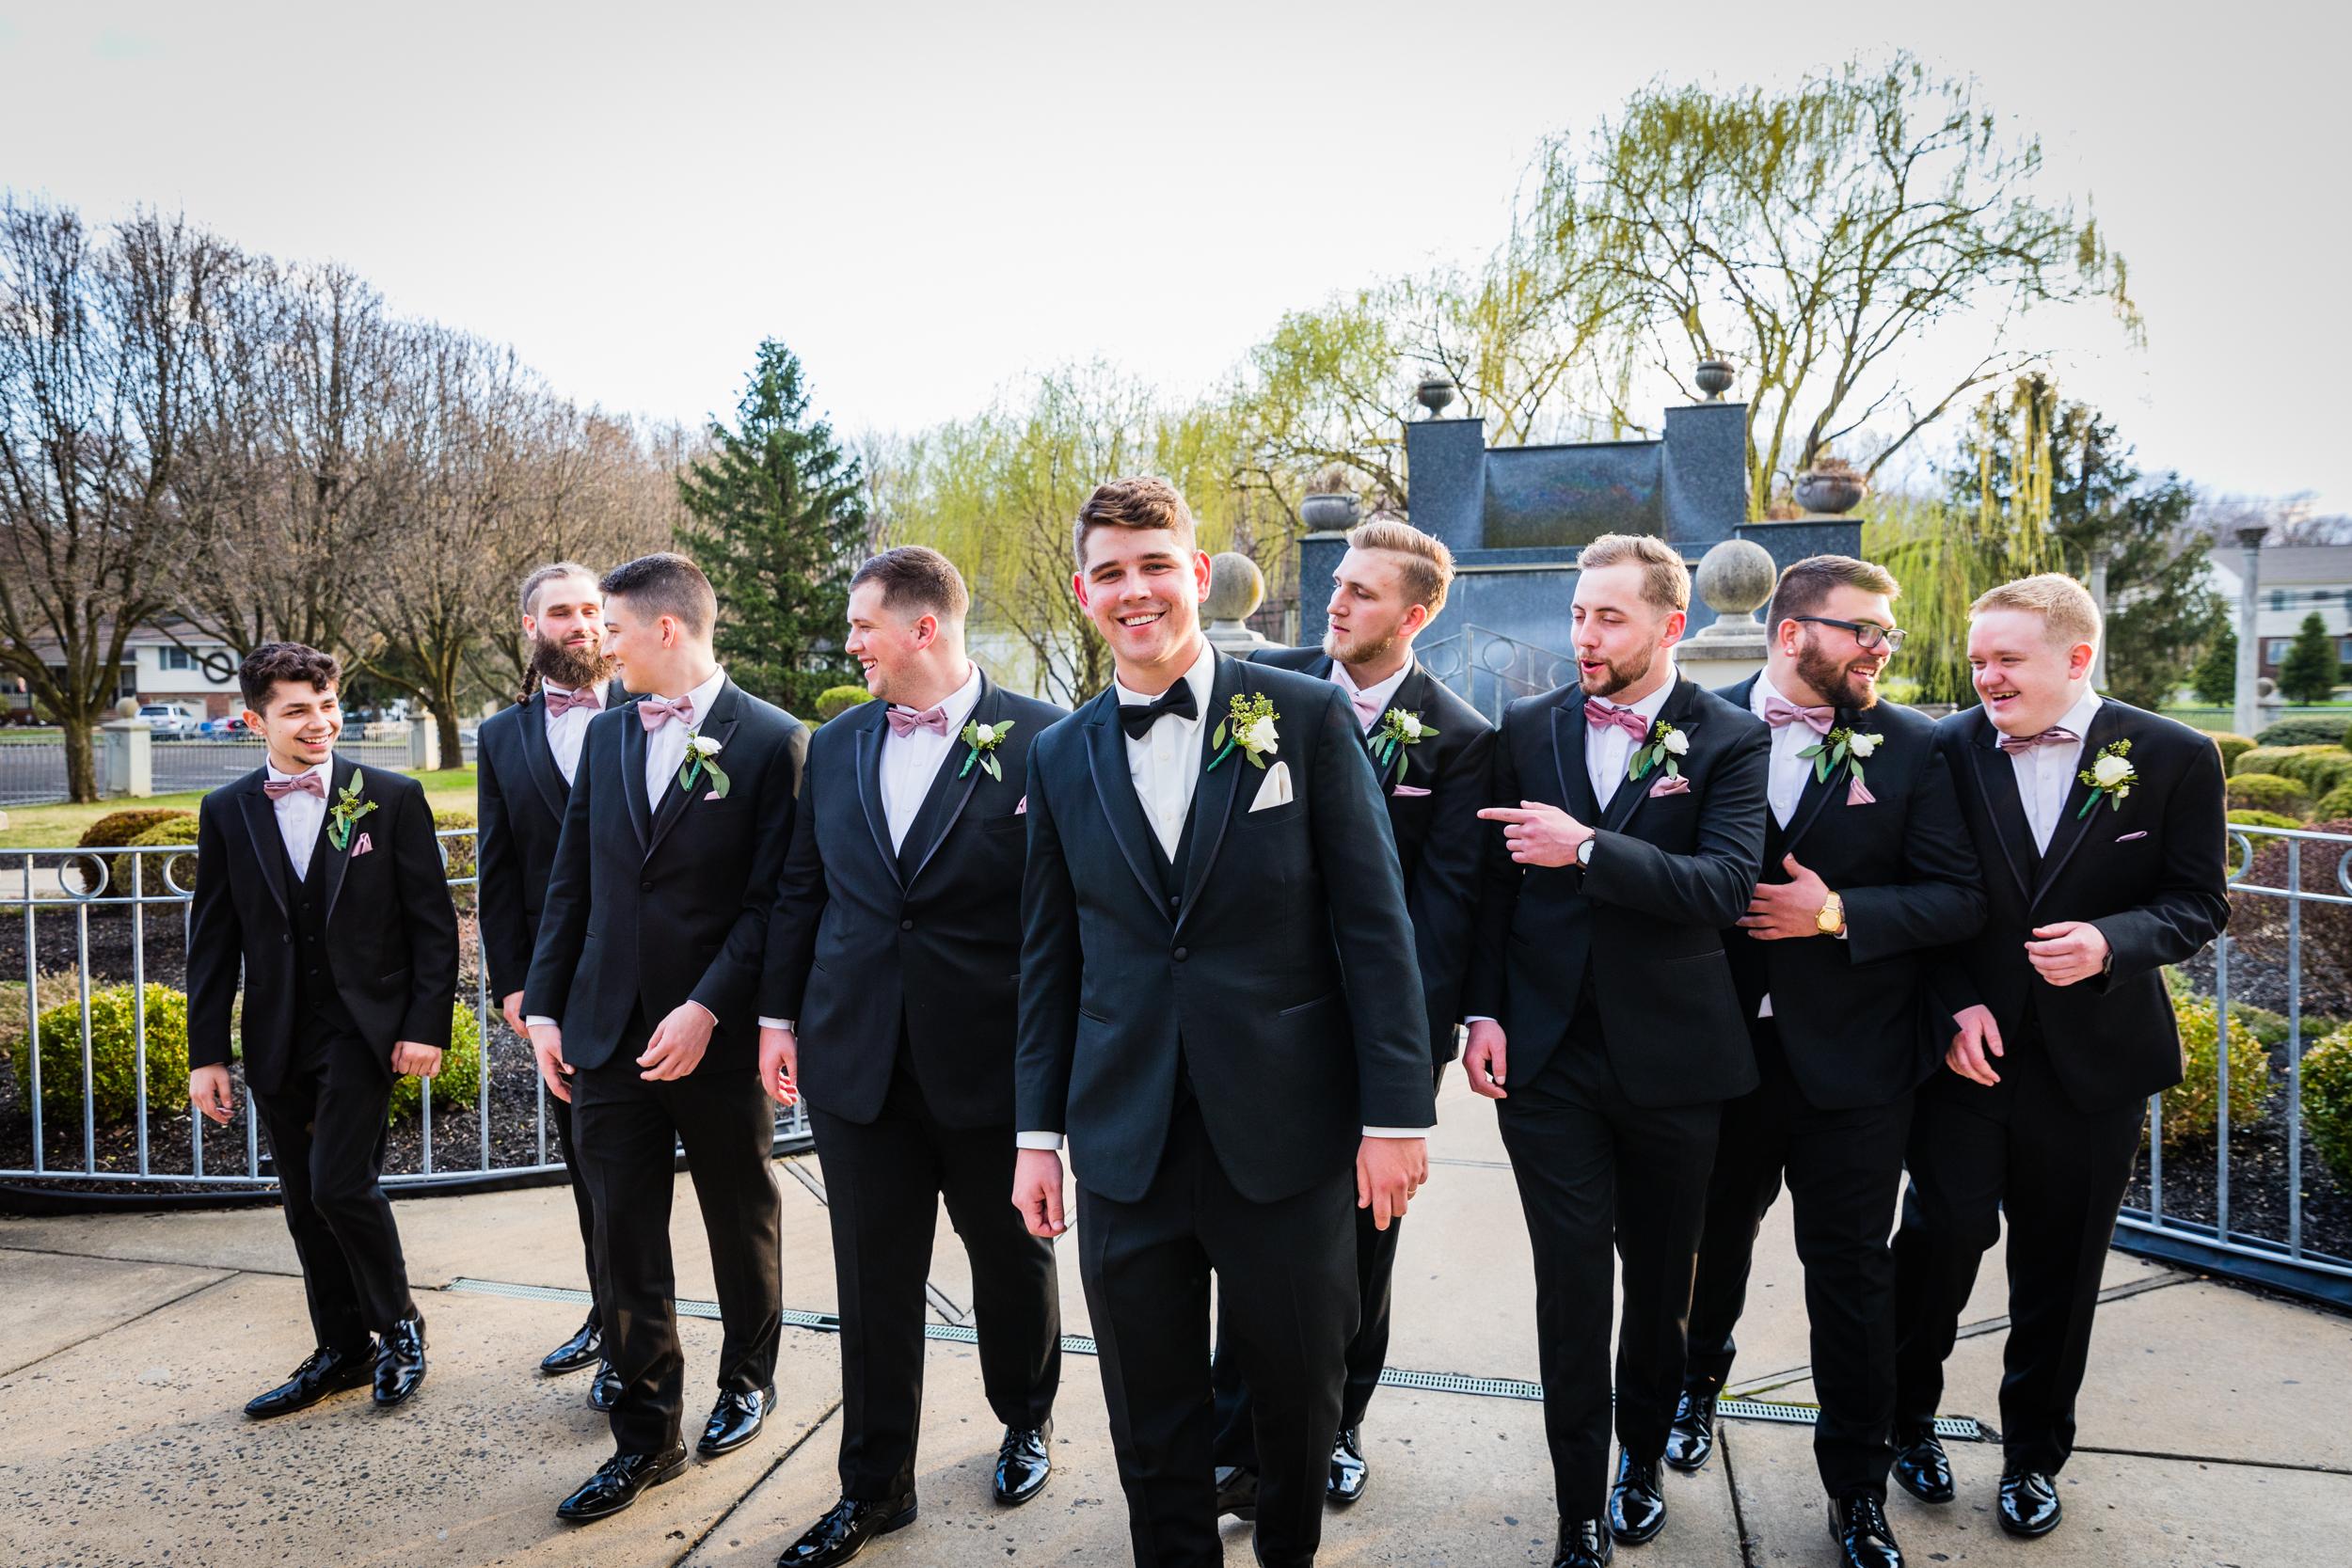 CELEBRATIONS BENSALEM WEDDING PHOTOGRAPHY-62.jpg